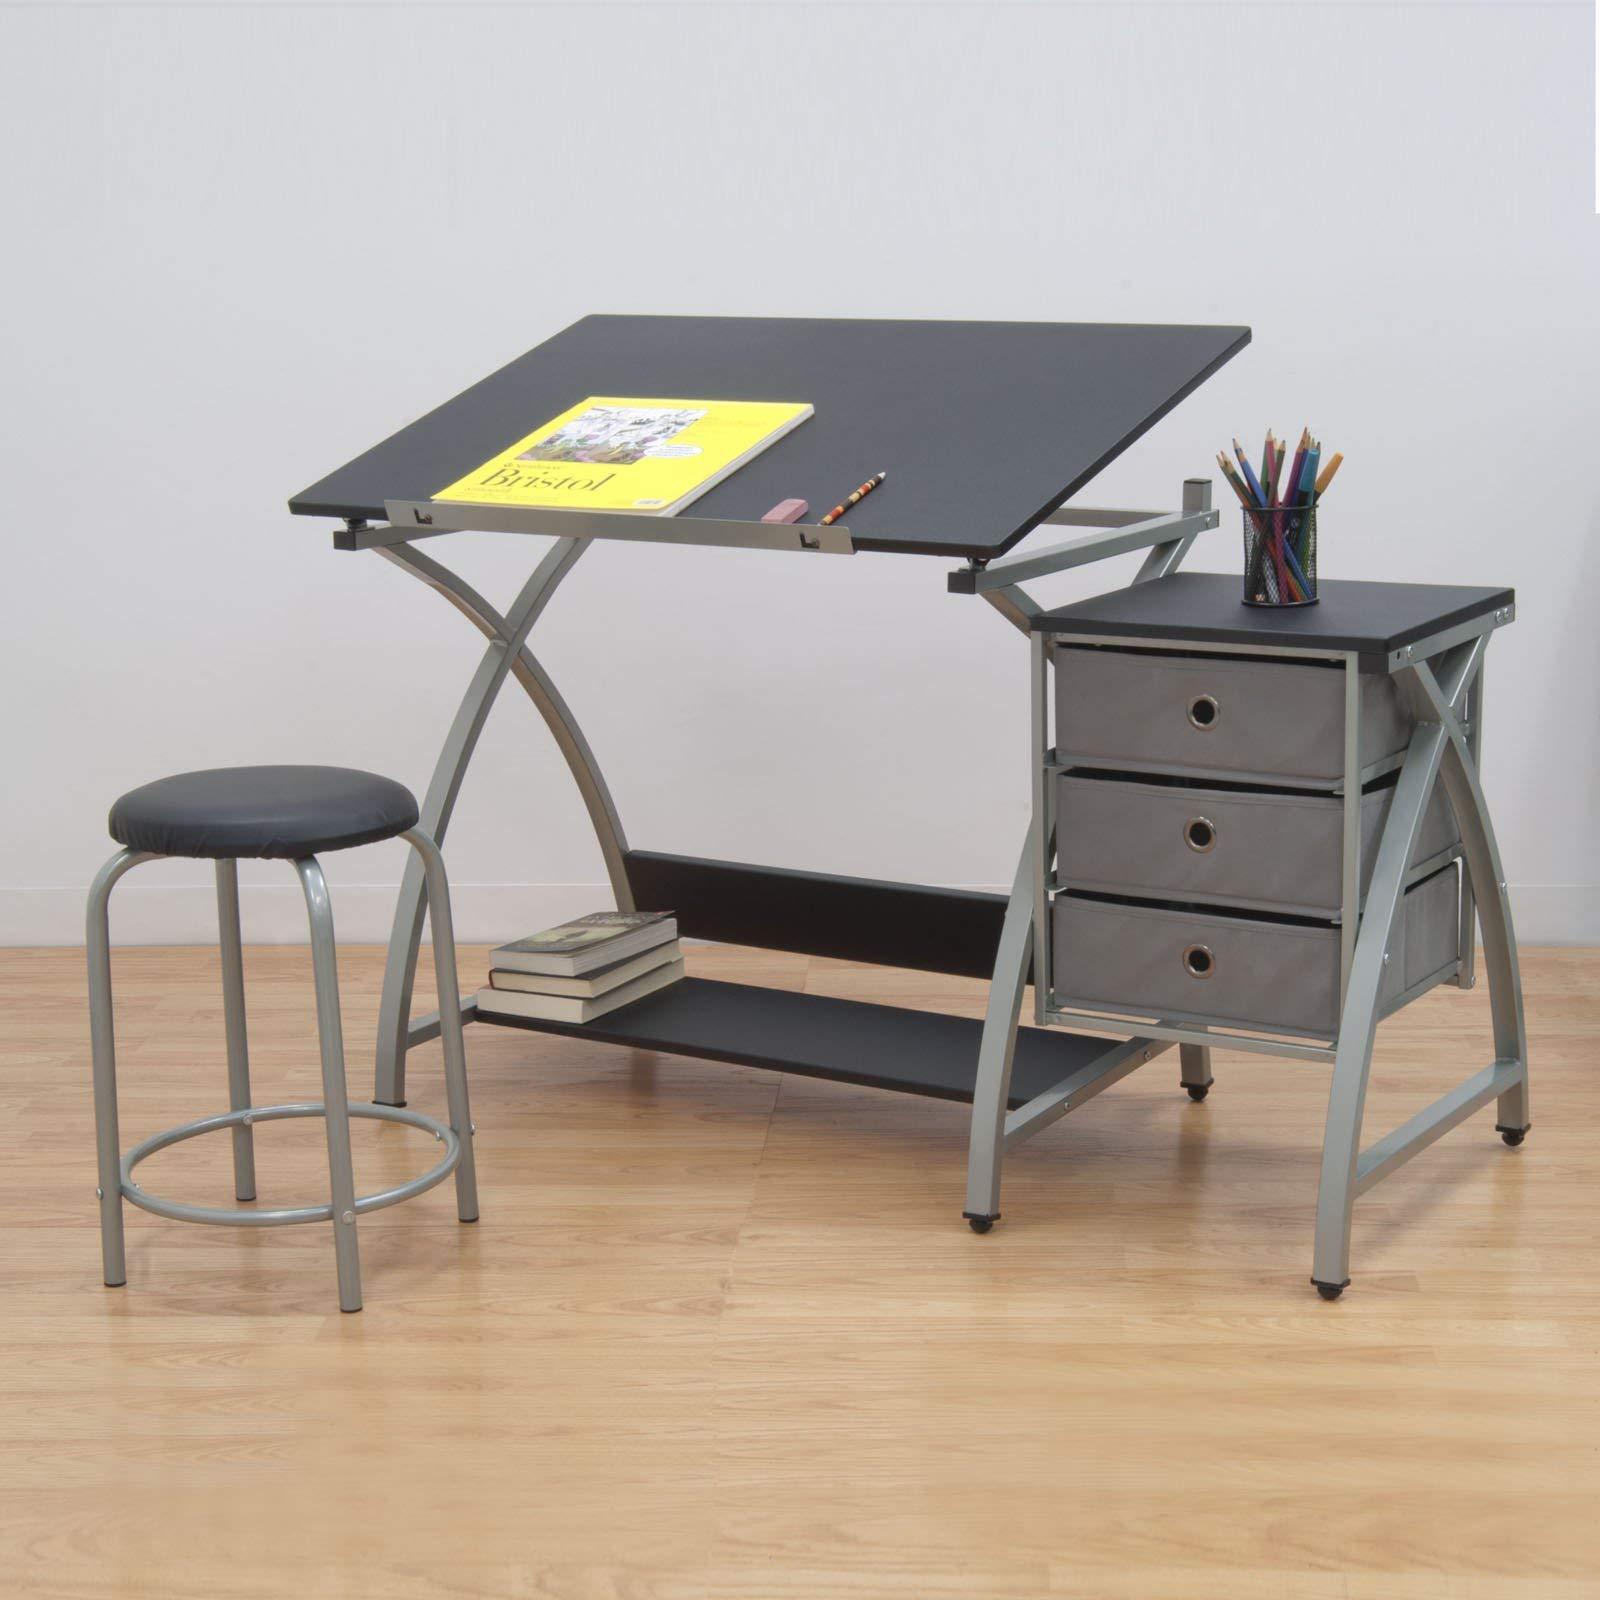 Studio Designs Laminate Craft Table Comet Center with Stool, Black (2 Pack) by STUDIO DESIGNS INSPIRING CREATIVITY WWW.STUDIODESIGNS.COM (Image #3)